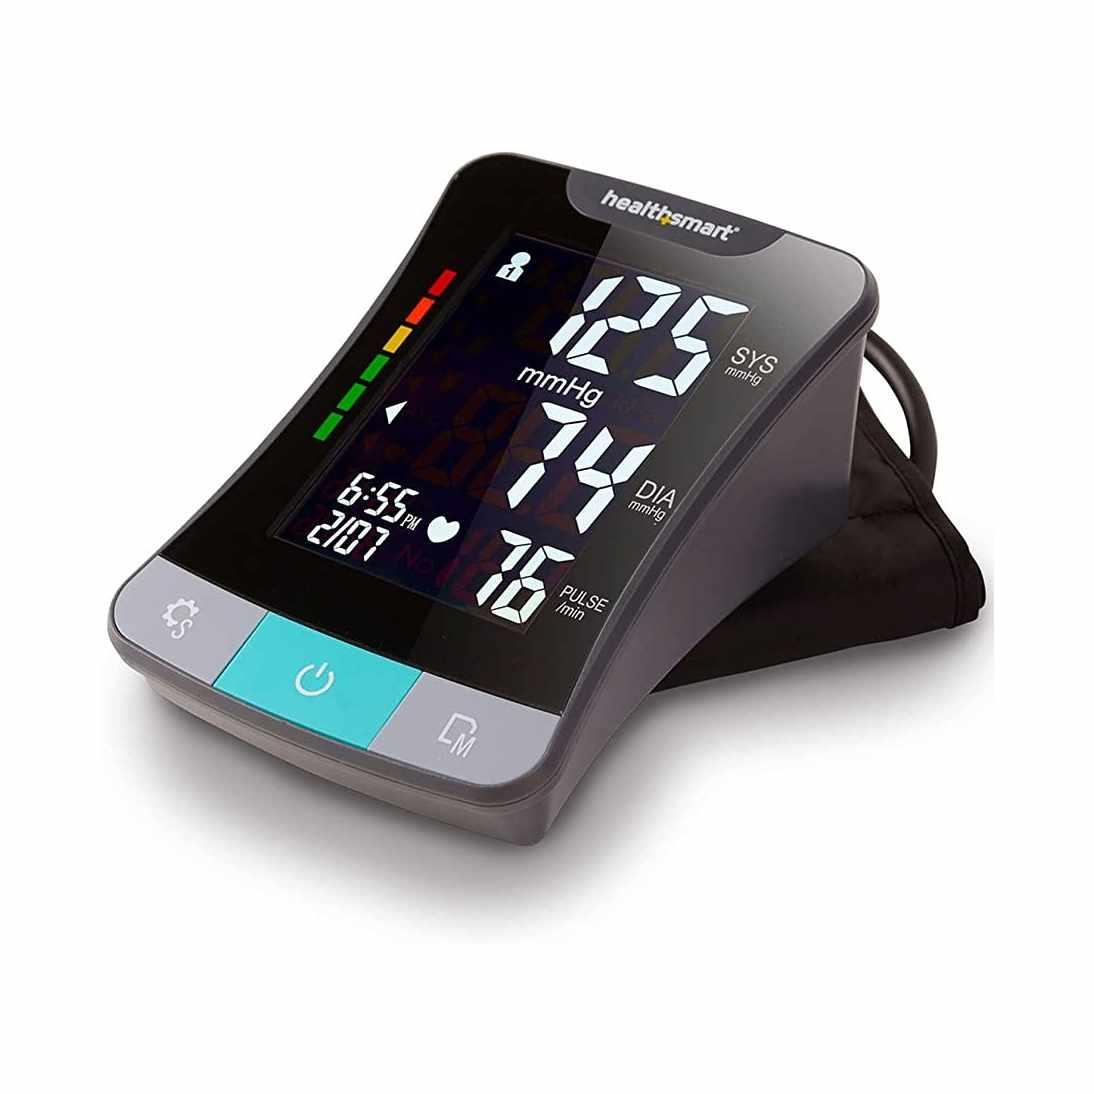 HealthSmart Premium Talking Digital Wrist Blood Pressure Monitor